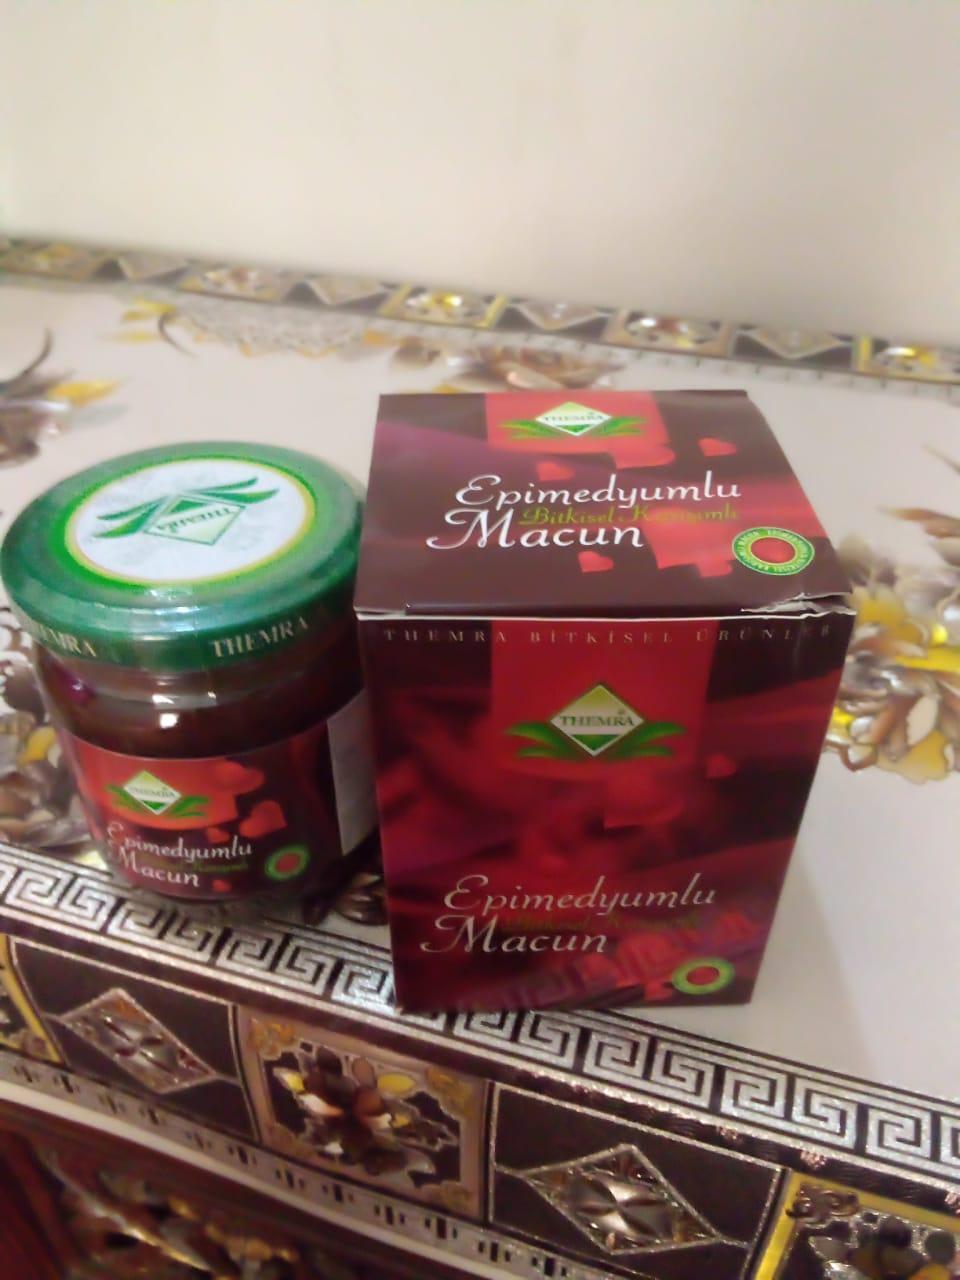 What is Themra Epimedium Macun in Islamabad – what does Epimedium macun do?